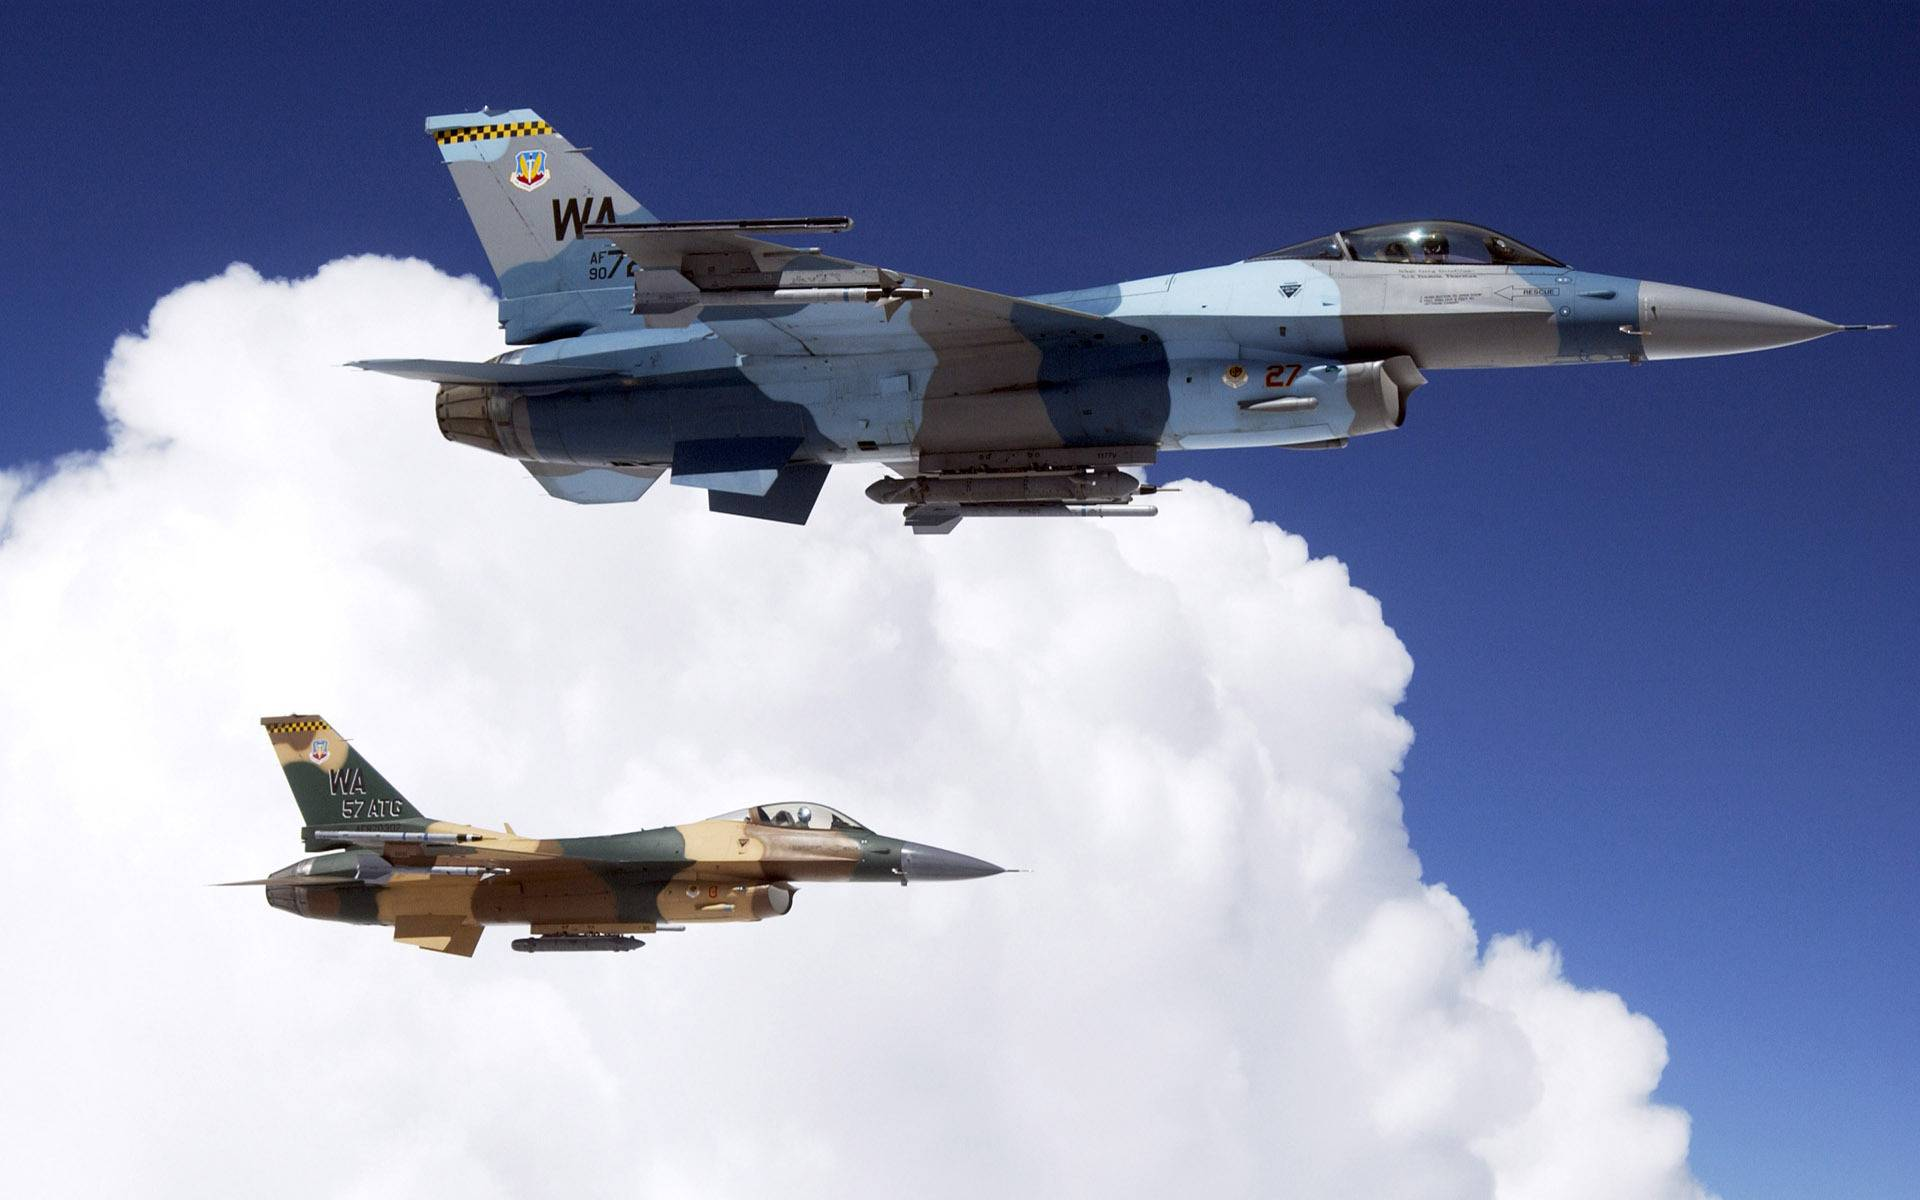 обои истребители, полет, облака картинки фото